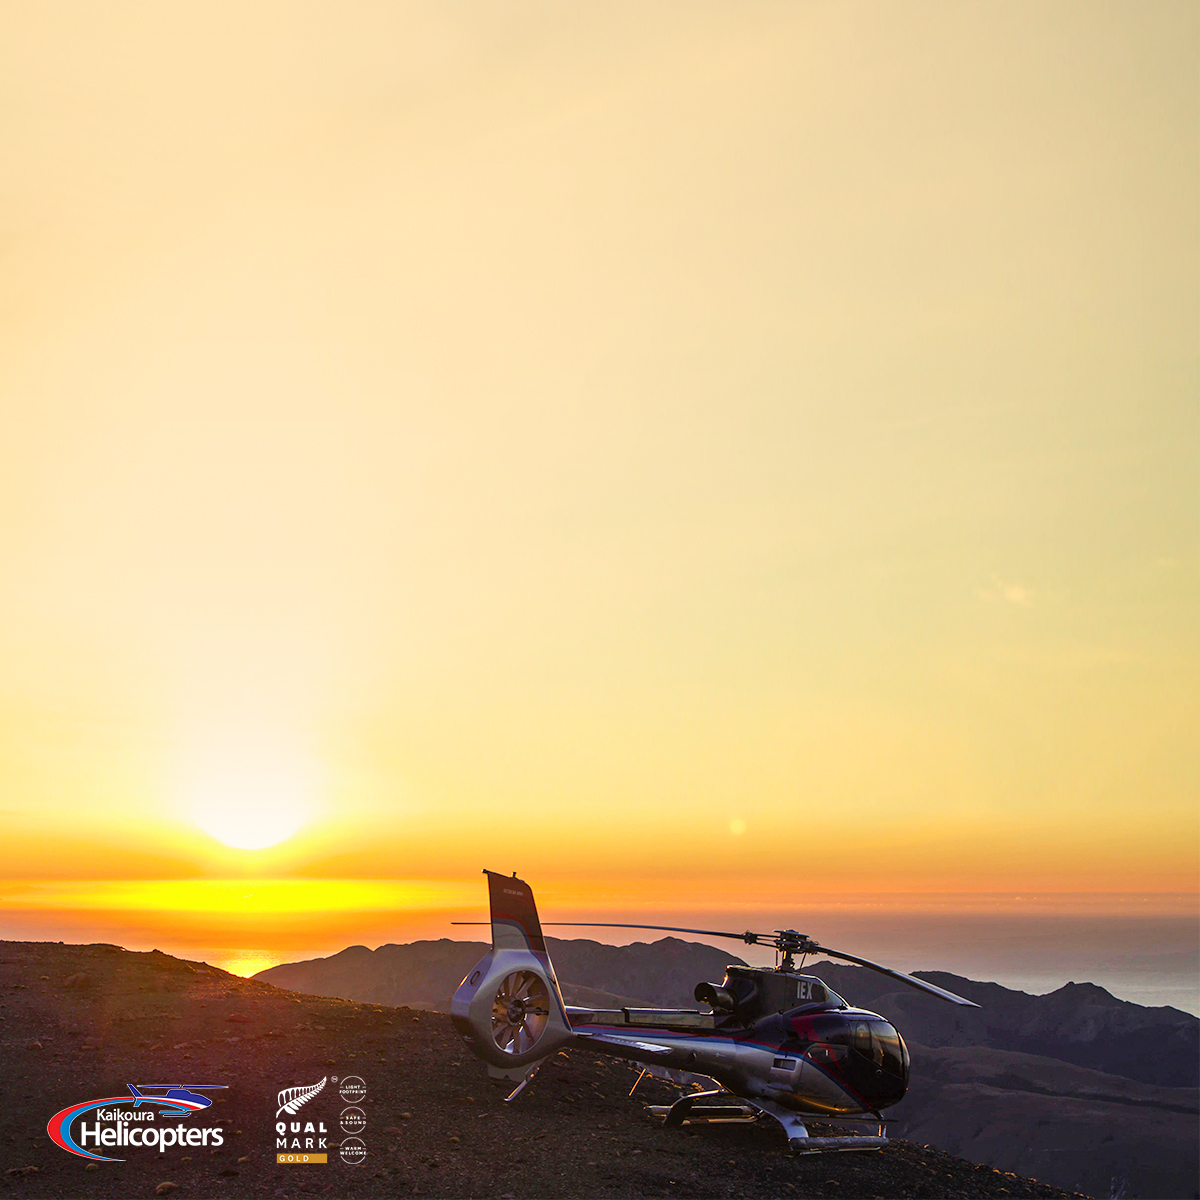 Kaikoura Helicopters Sunrise / Sunset flights